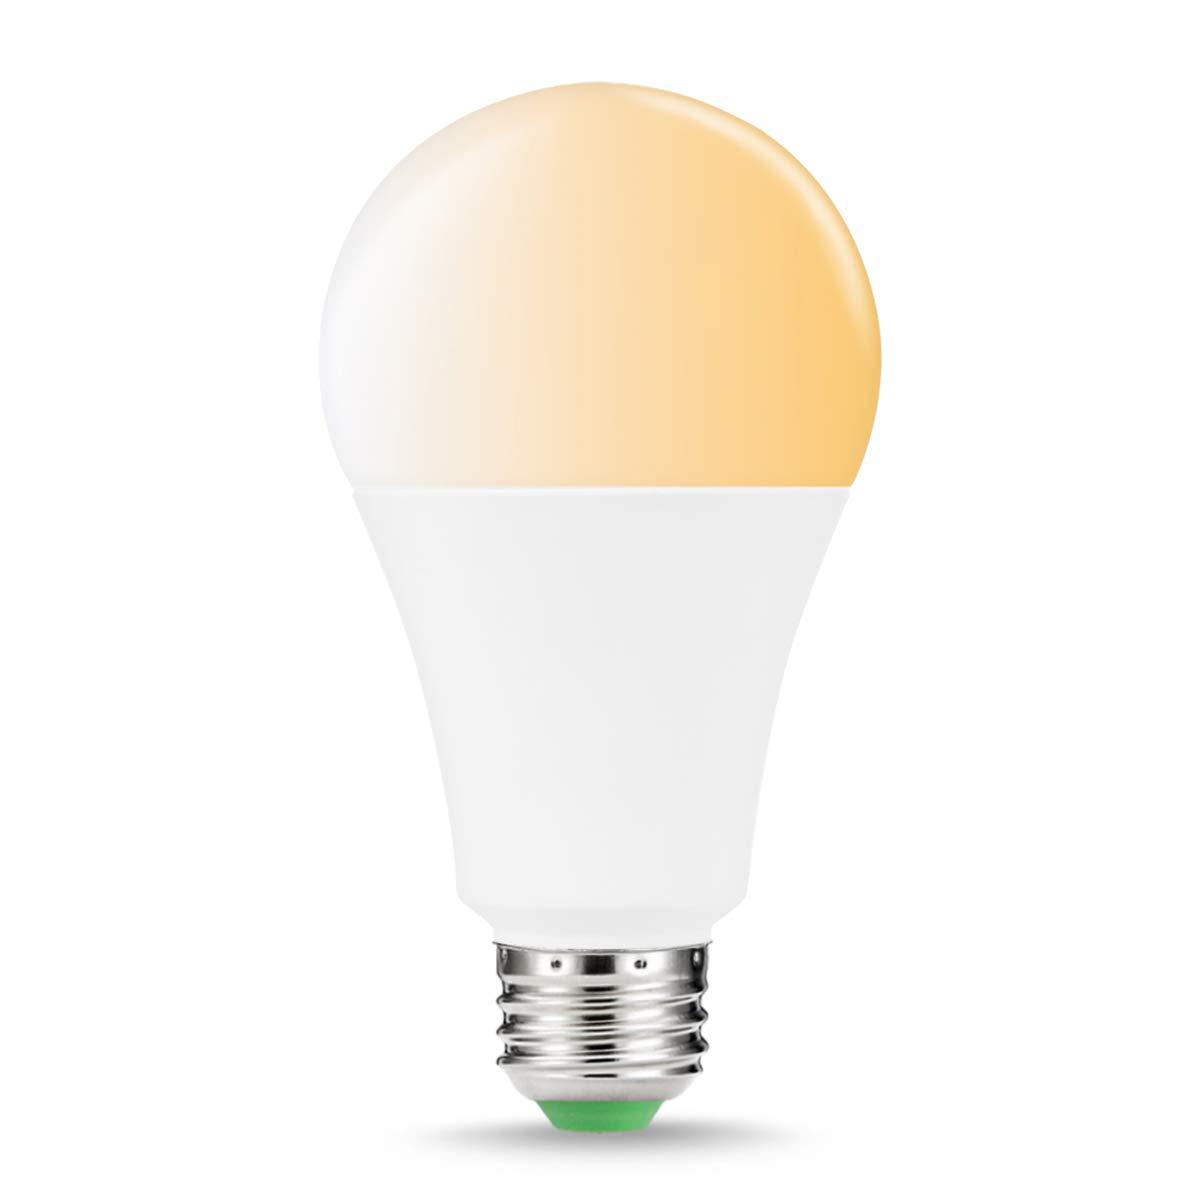 14W 110W Equivalent LED Light Bulb EXTSUD WiFi Smart Bulb B22 Warm White to